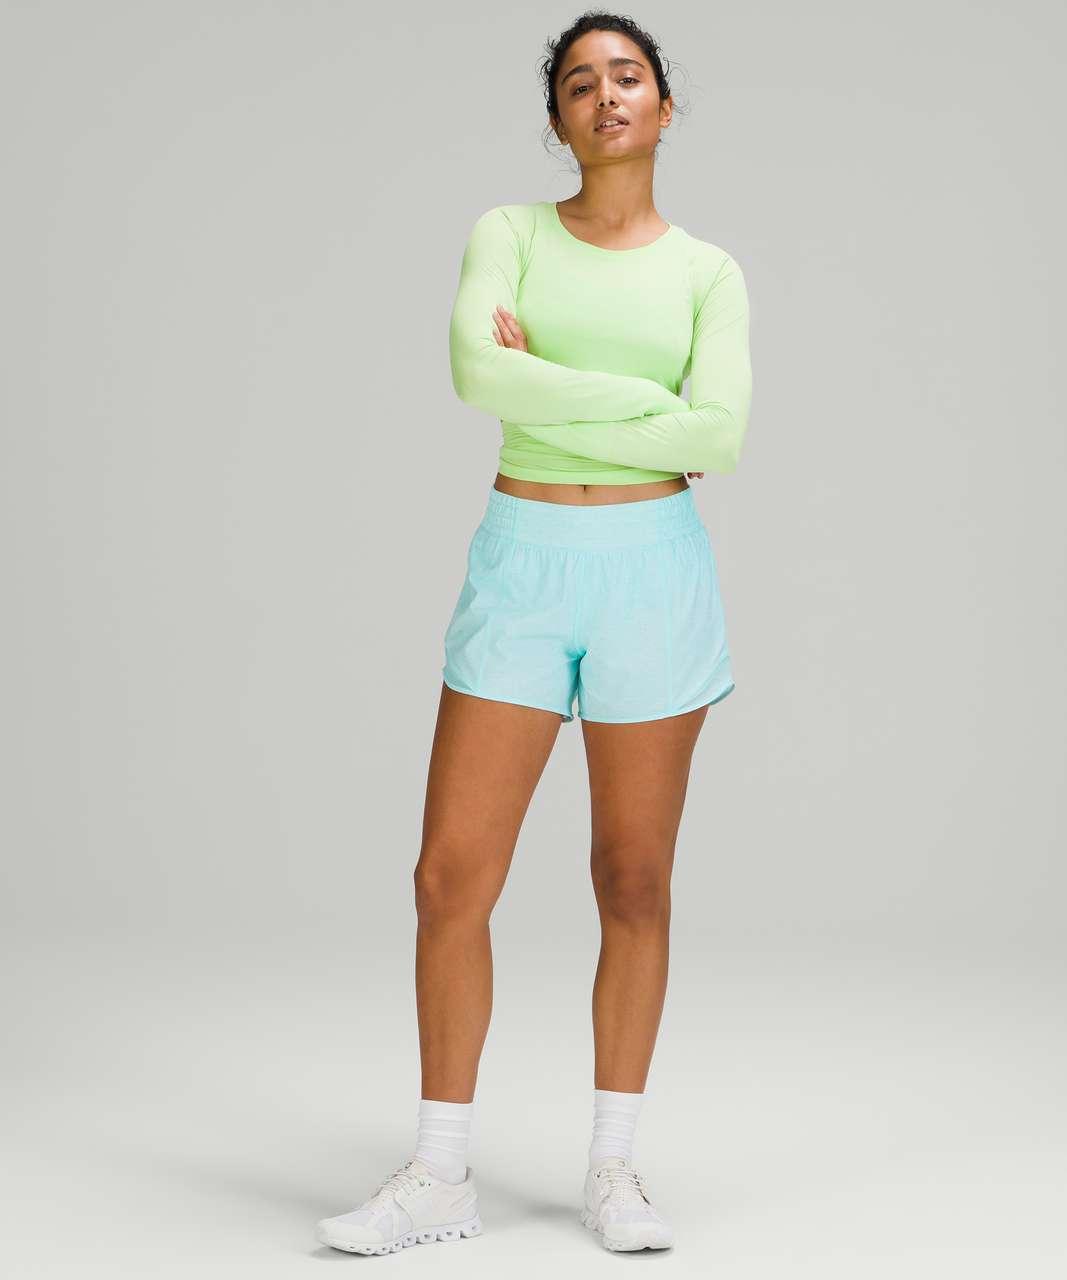 "Lululemon Hotty Hot High-Rise Short 4"" - Heather Lux Multi Icing Blue / Icing Blue"